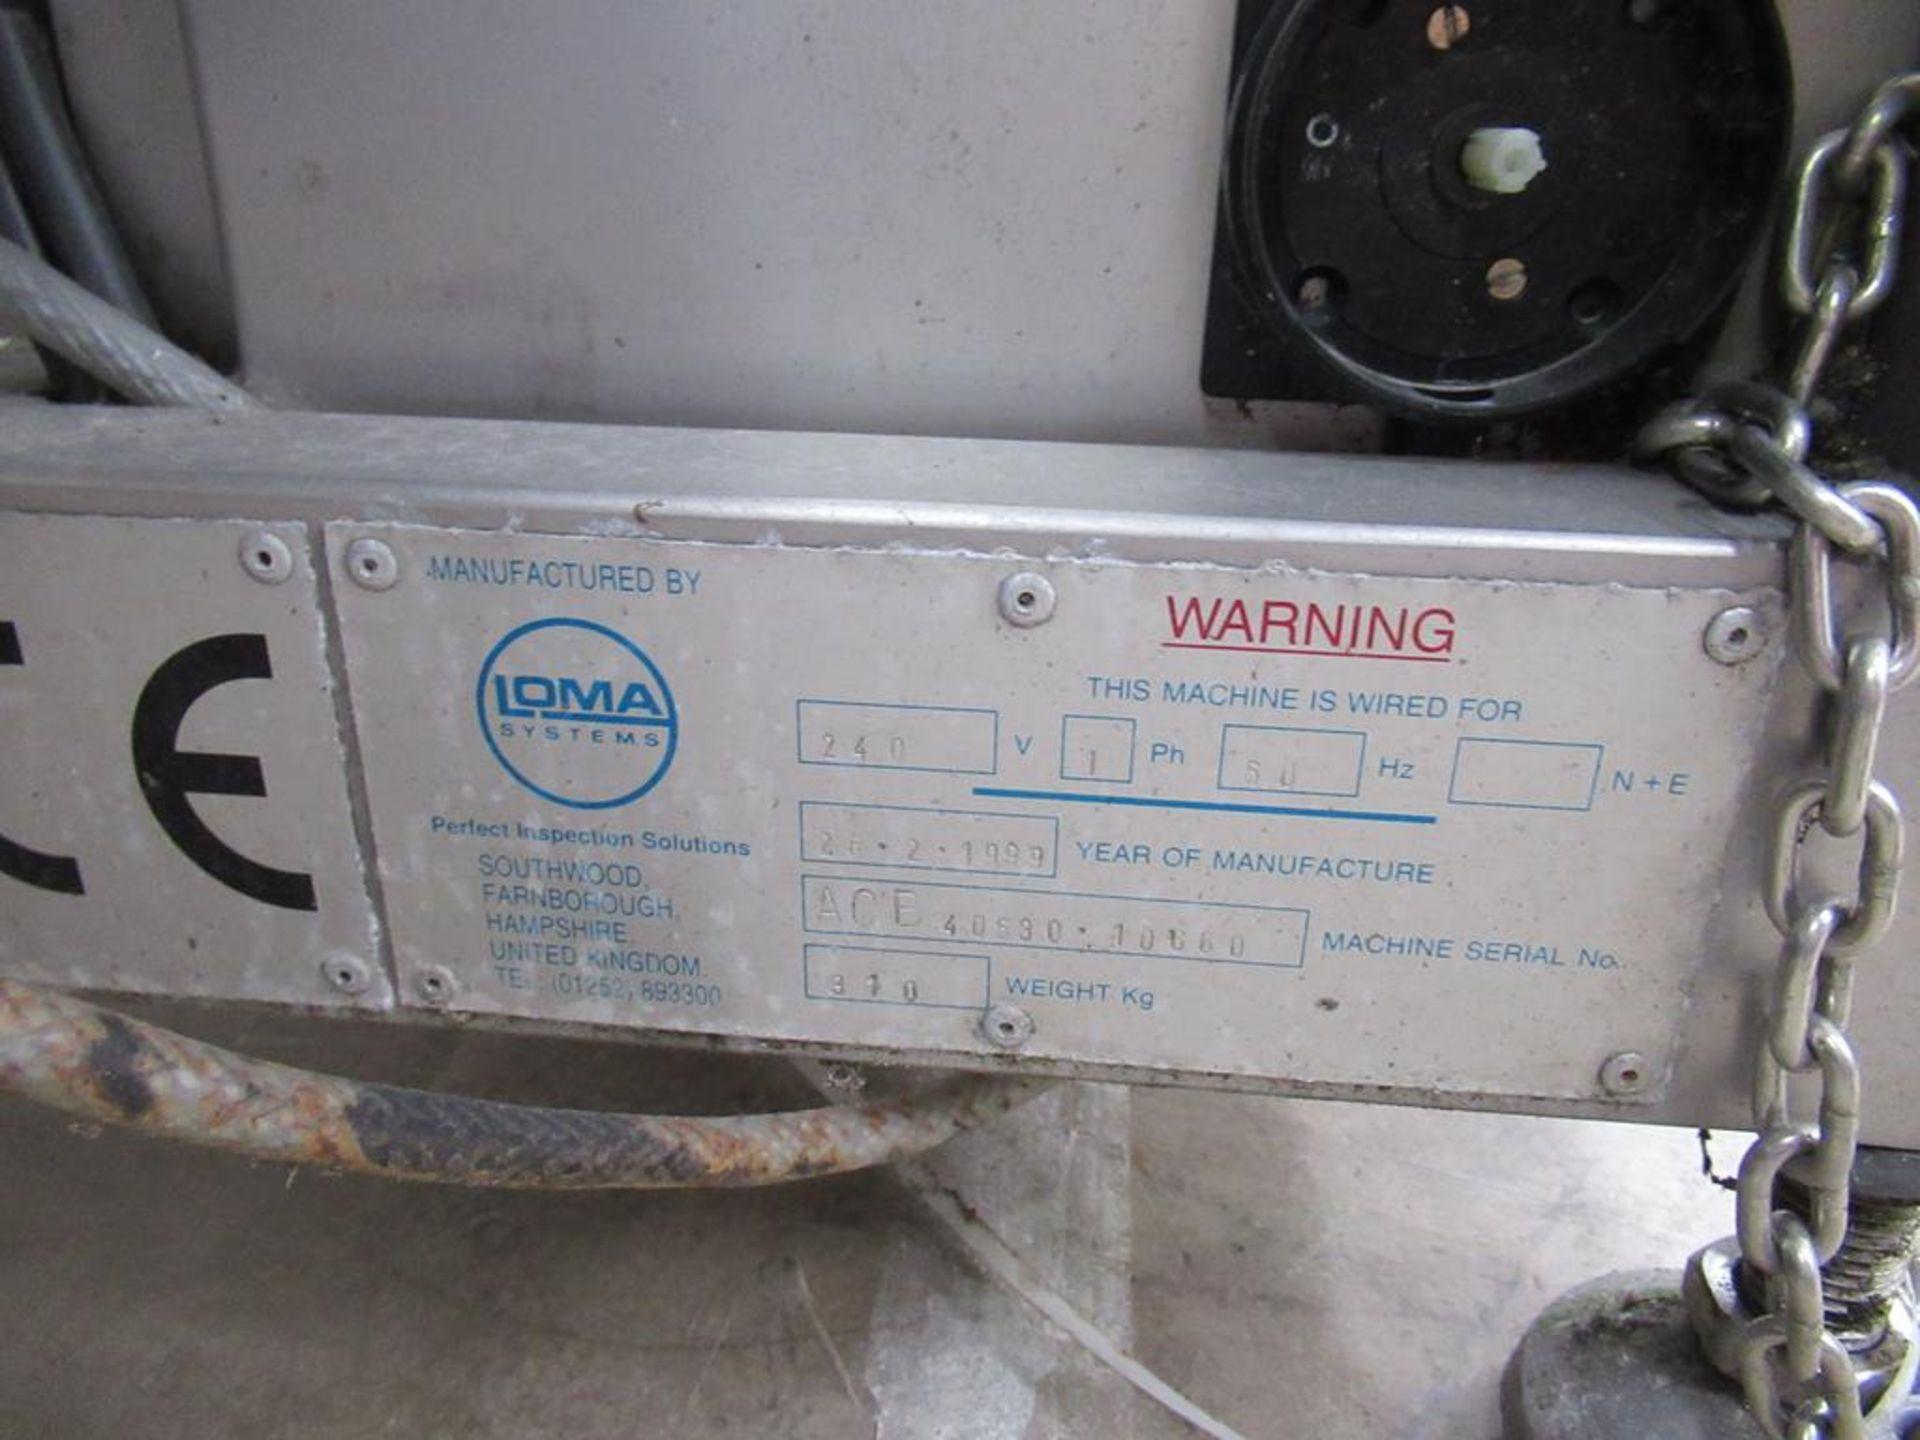 Loma 7000 Metal Detecting Conveyor - Image 7 of 7